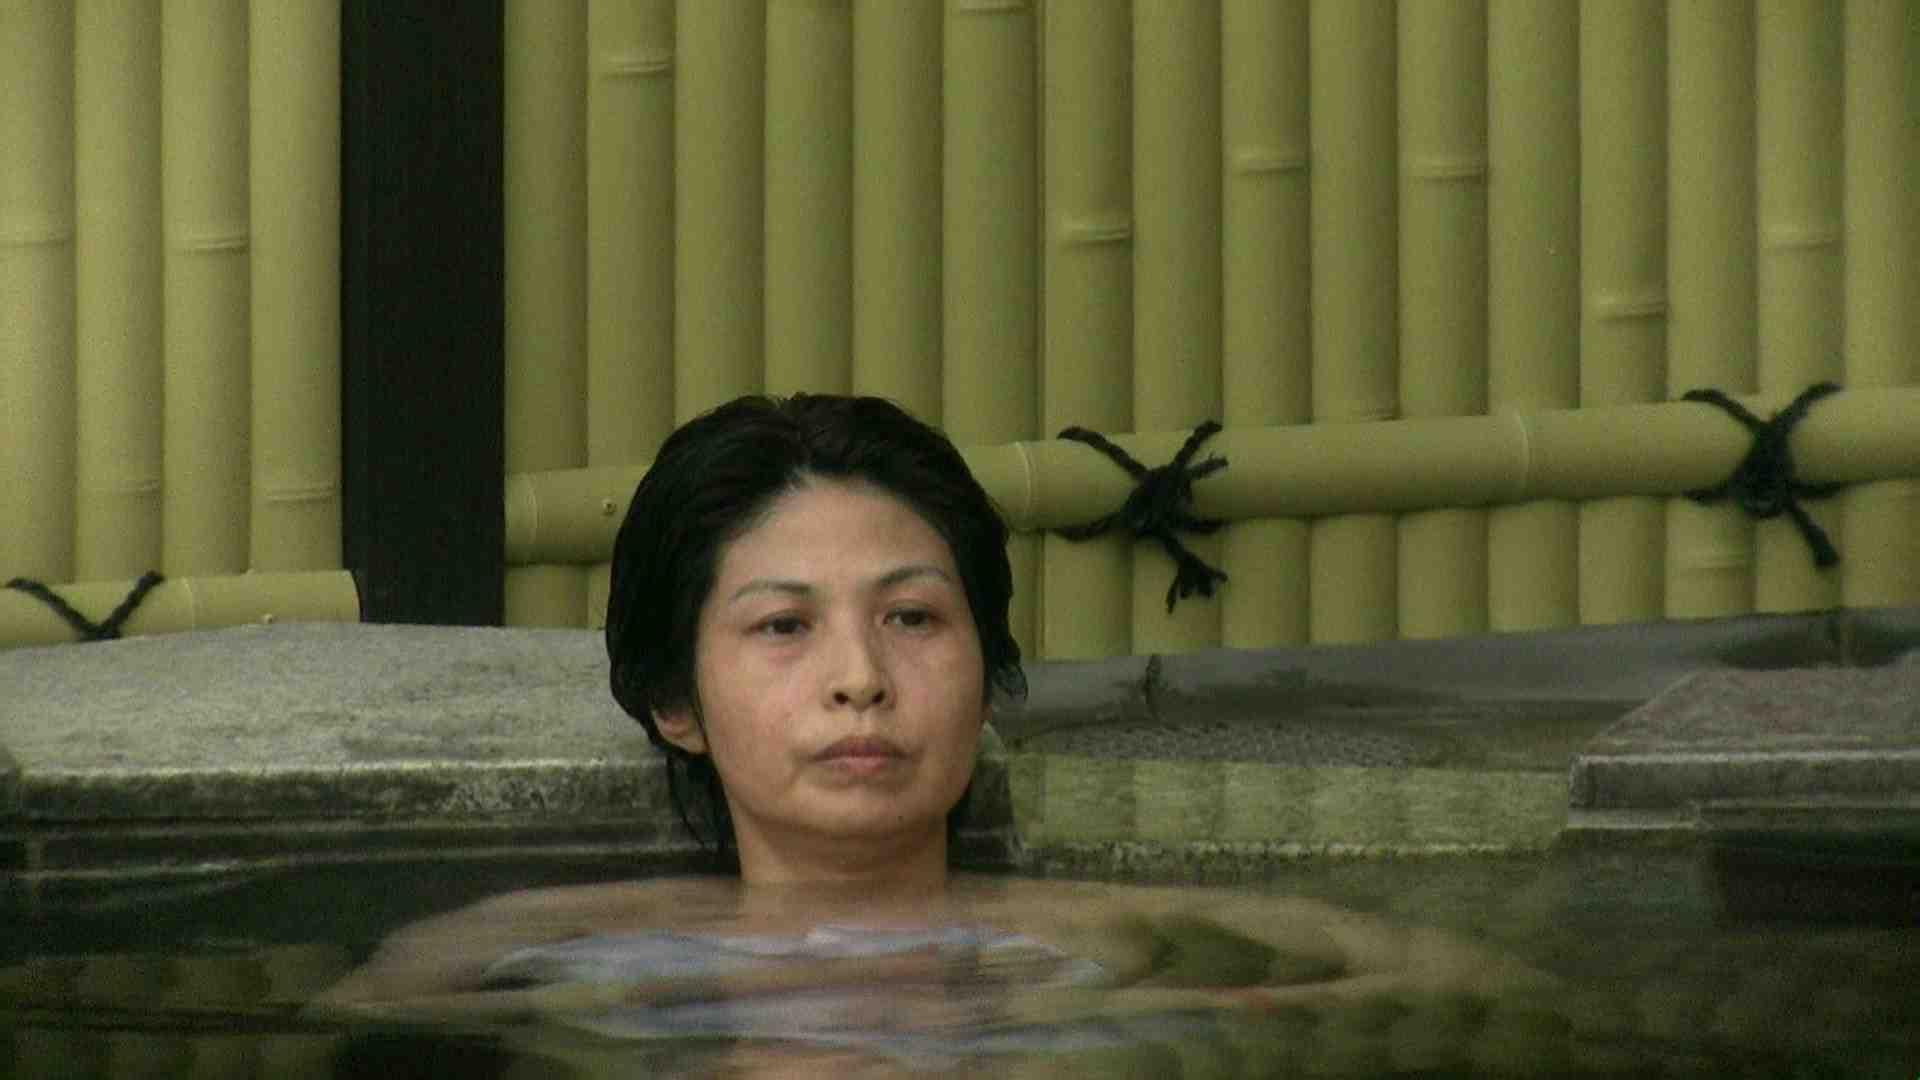 Aquaな露天風呂Vol.636 OL女体  87連発 30